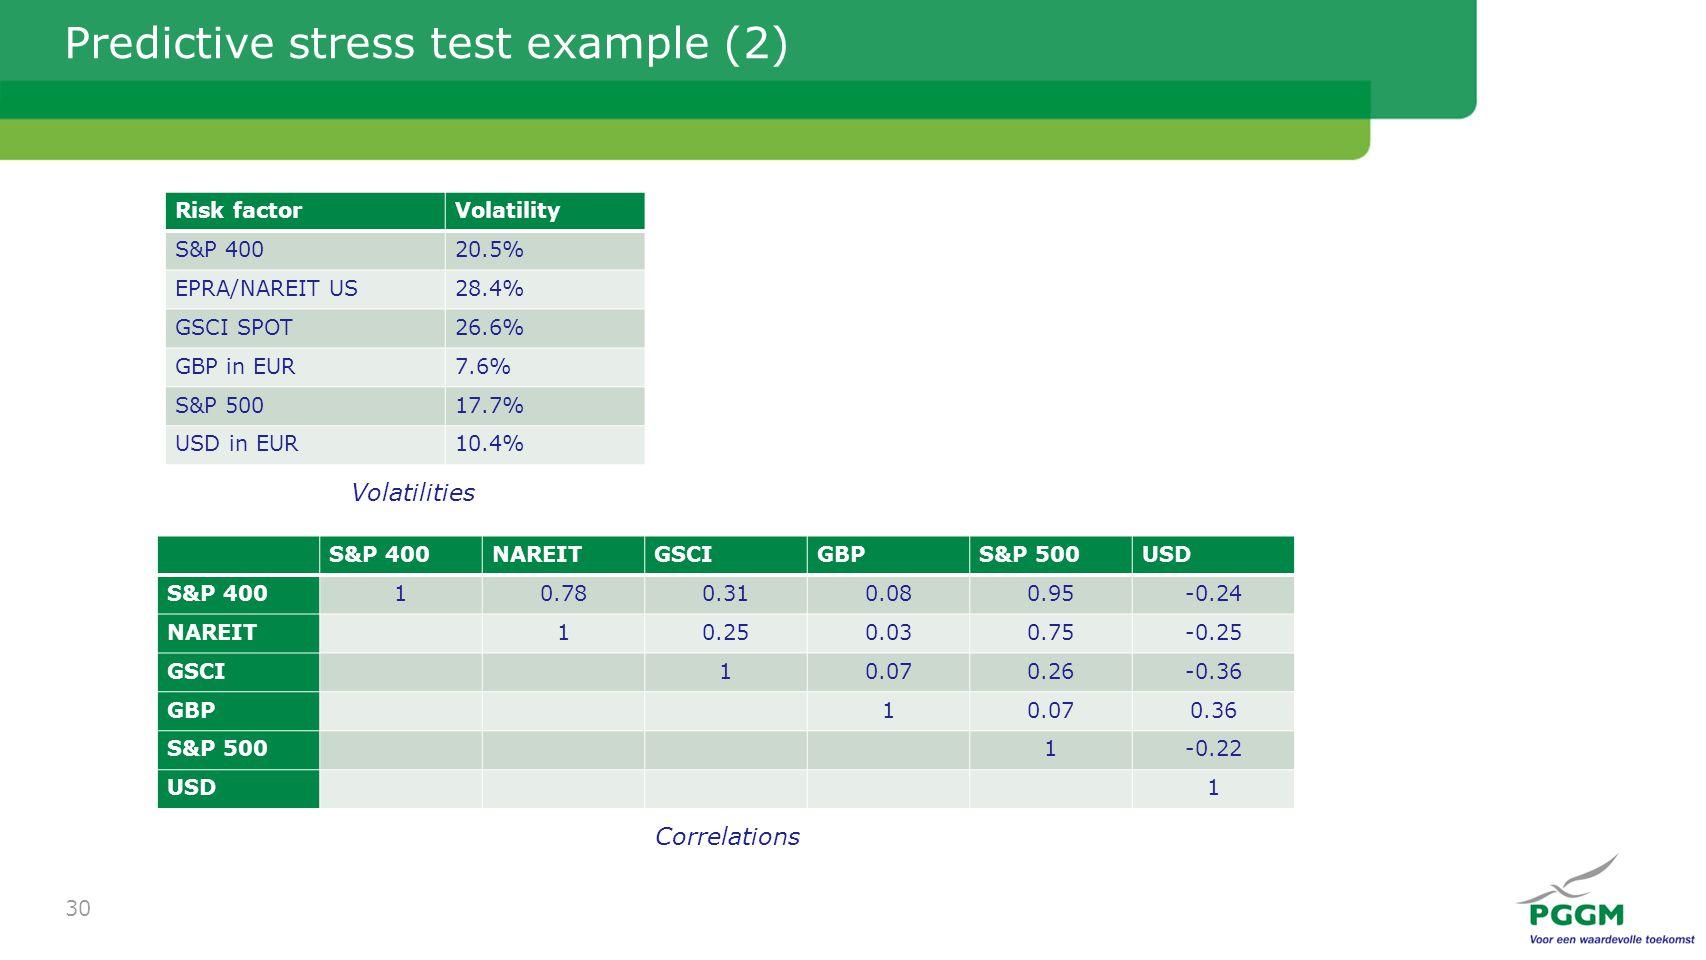 Predictive stress test example (2) 30 S&P 400NAREITGSCIGBPS&P 500USD S&P 40010.780.310.080.95-0.24 NAREIT10.250.030.75-0.25 GSCI10.070.26-0.36 GBP10.070.36 S&P 5001-0.22 USD1 Risk factorVolatility S&P 40020.5% EPRA/NAREIT US28.4% GSCI SPOT26.6% GBP in EUR7.6% S&P 50017.7% USD in EUR10.4% Volatilities Correlations